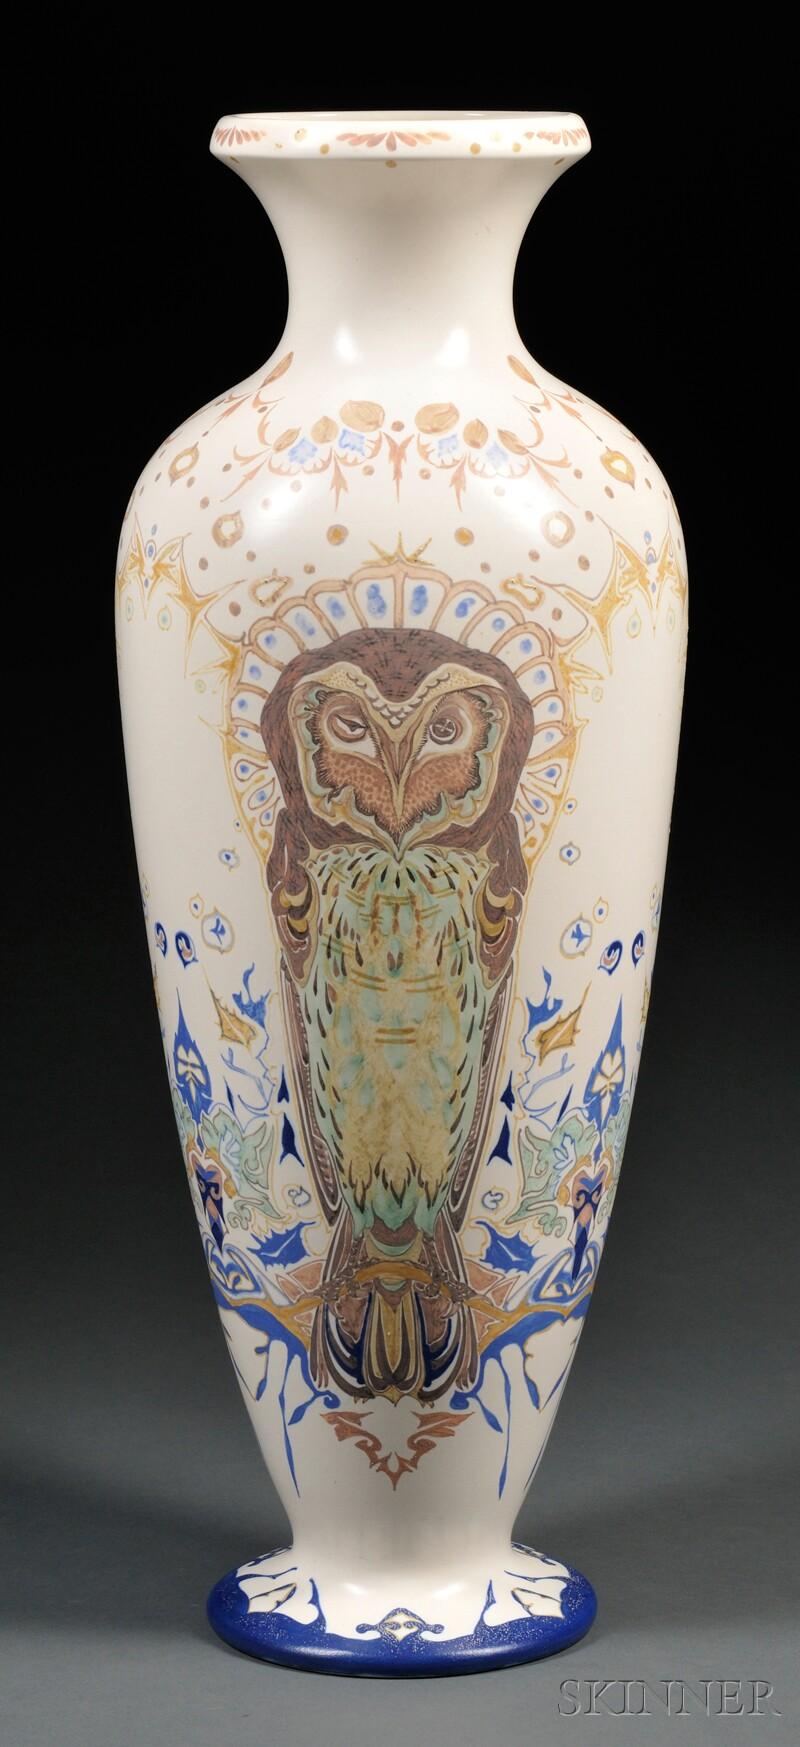 Experimental zuid holland gouda pottery matte glaze floor vase lot image reviewsmspy